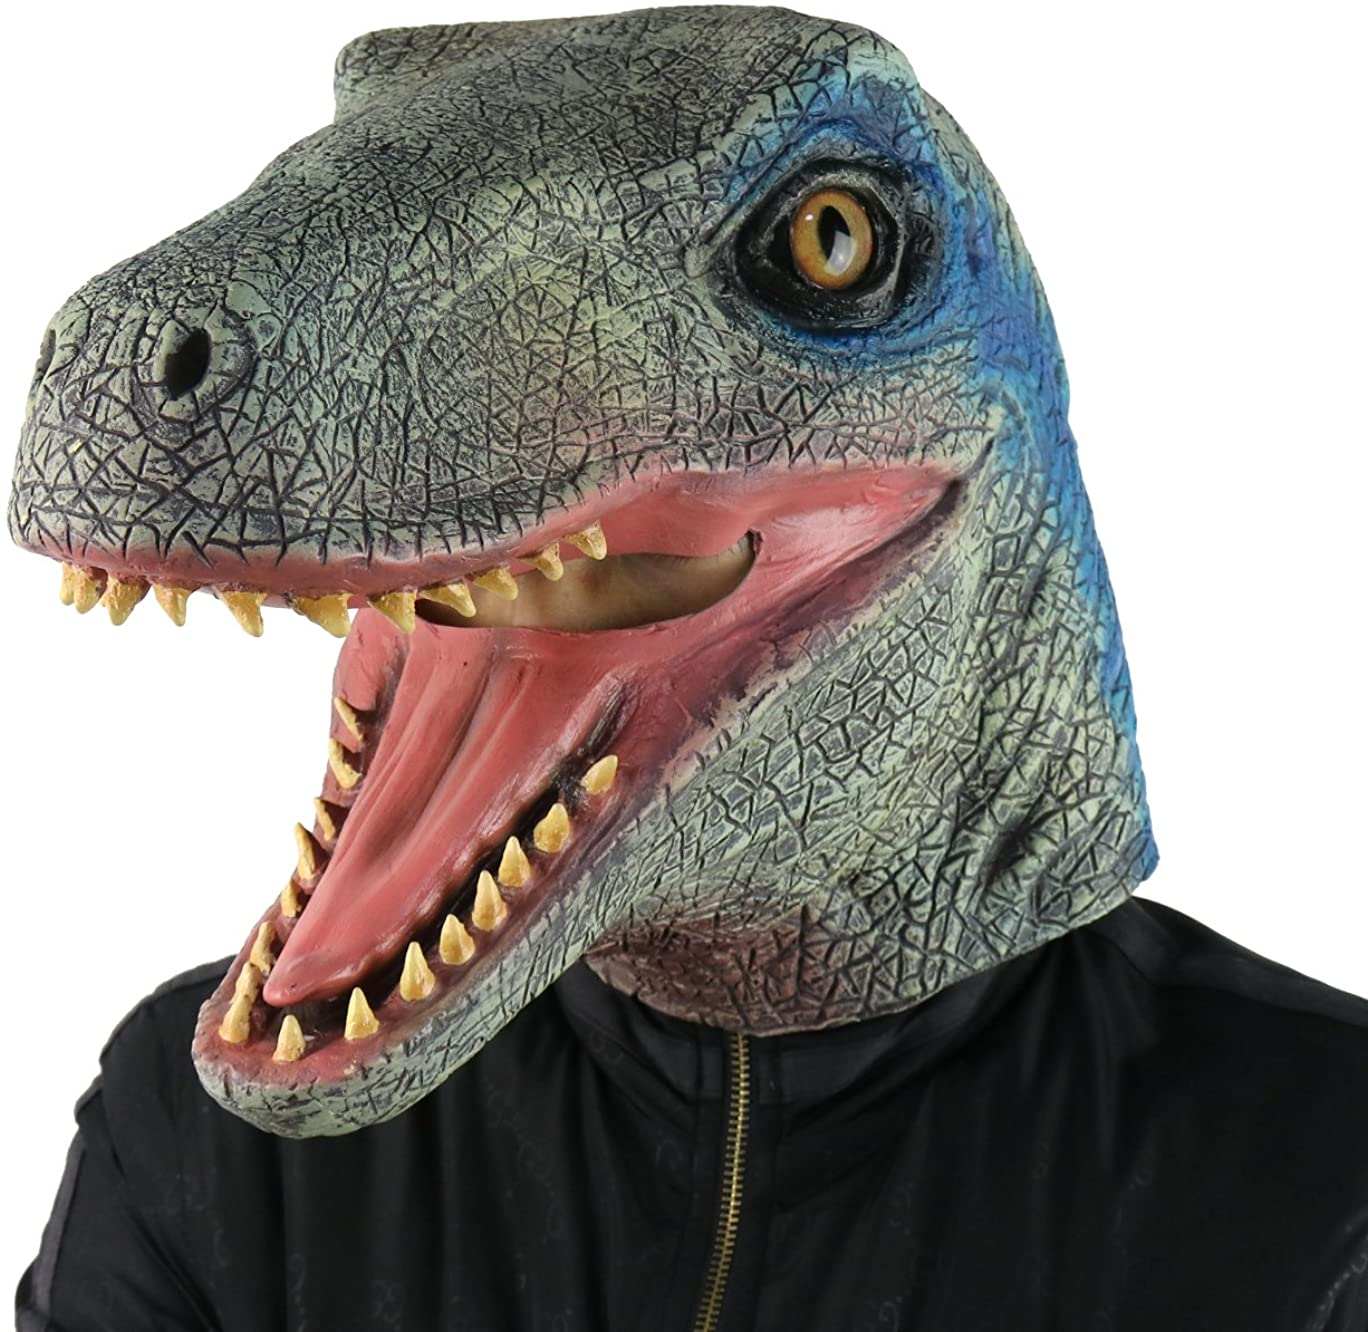 FantasyParty Halloween Mask Costume Party Latex Jurassic Dinosaur Head Mask Velociraptor